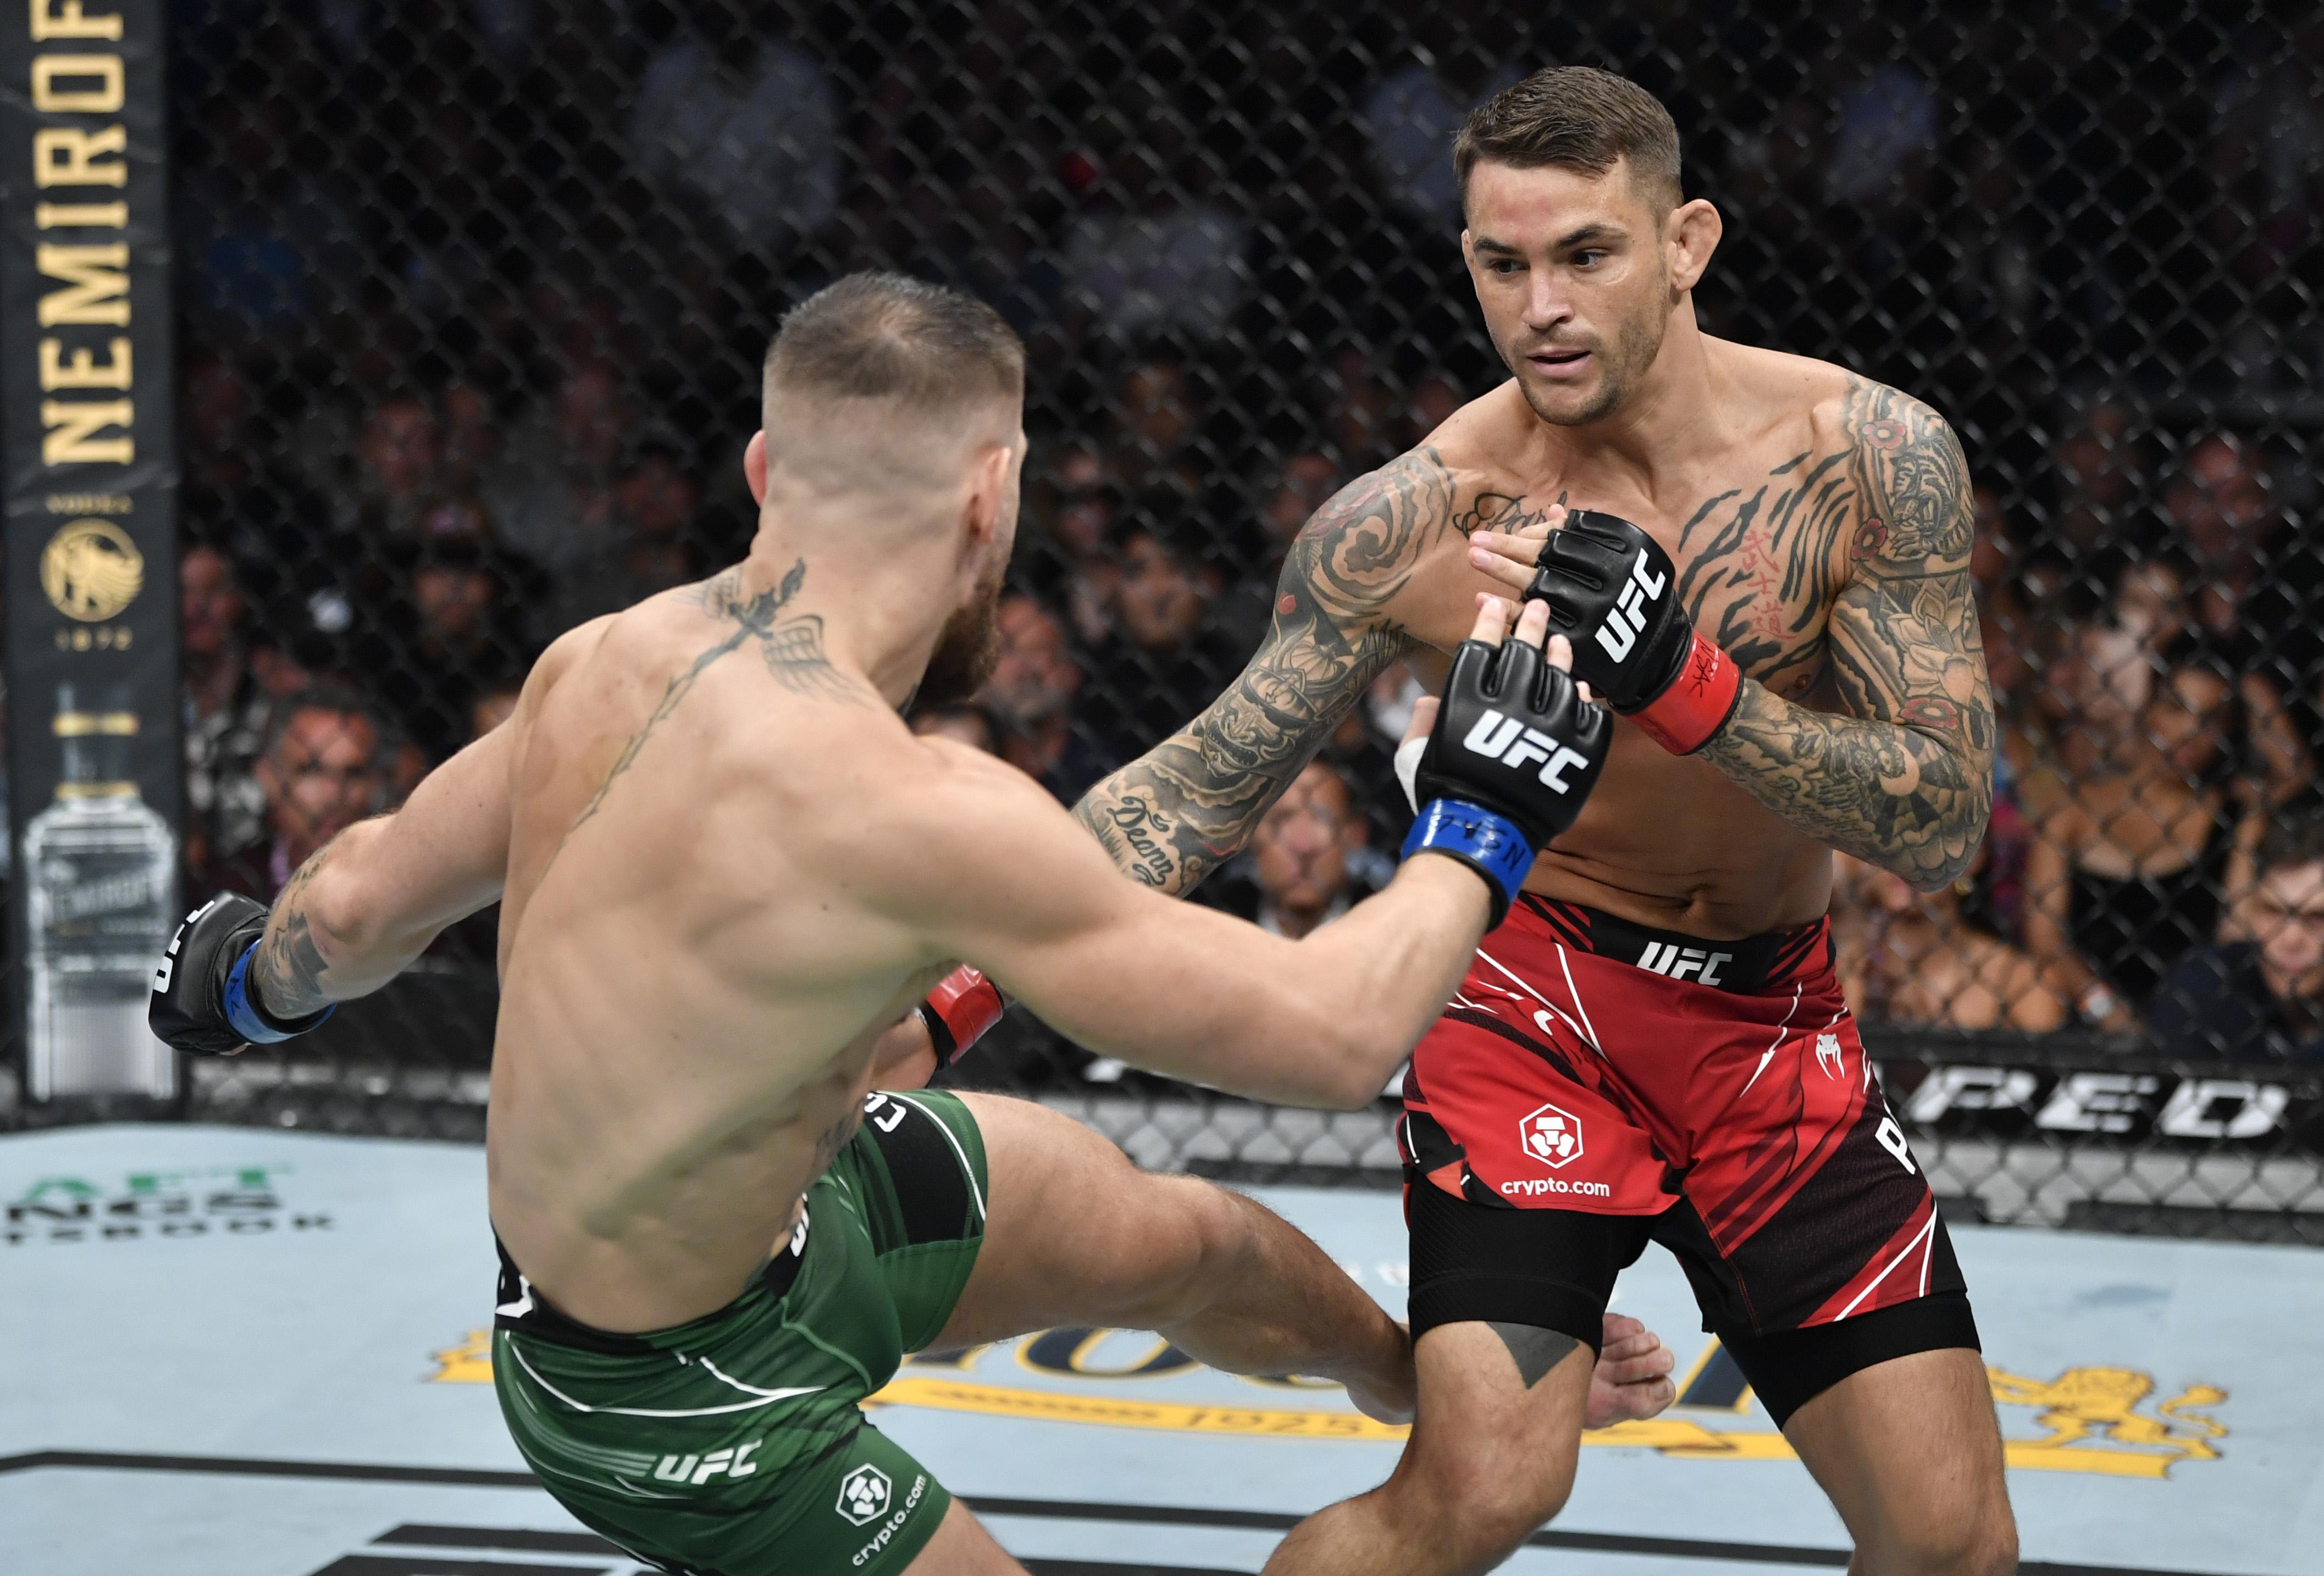 Dustin Poirier absorbs one of Conor McGregor's leg kicks at UFC 264.